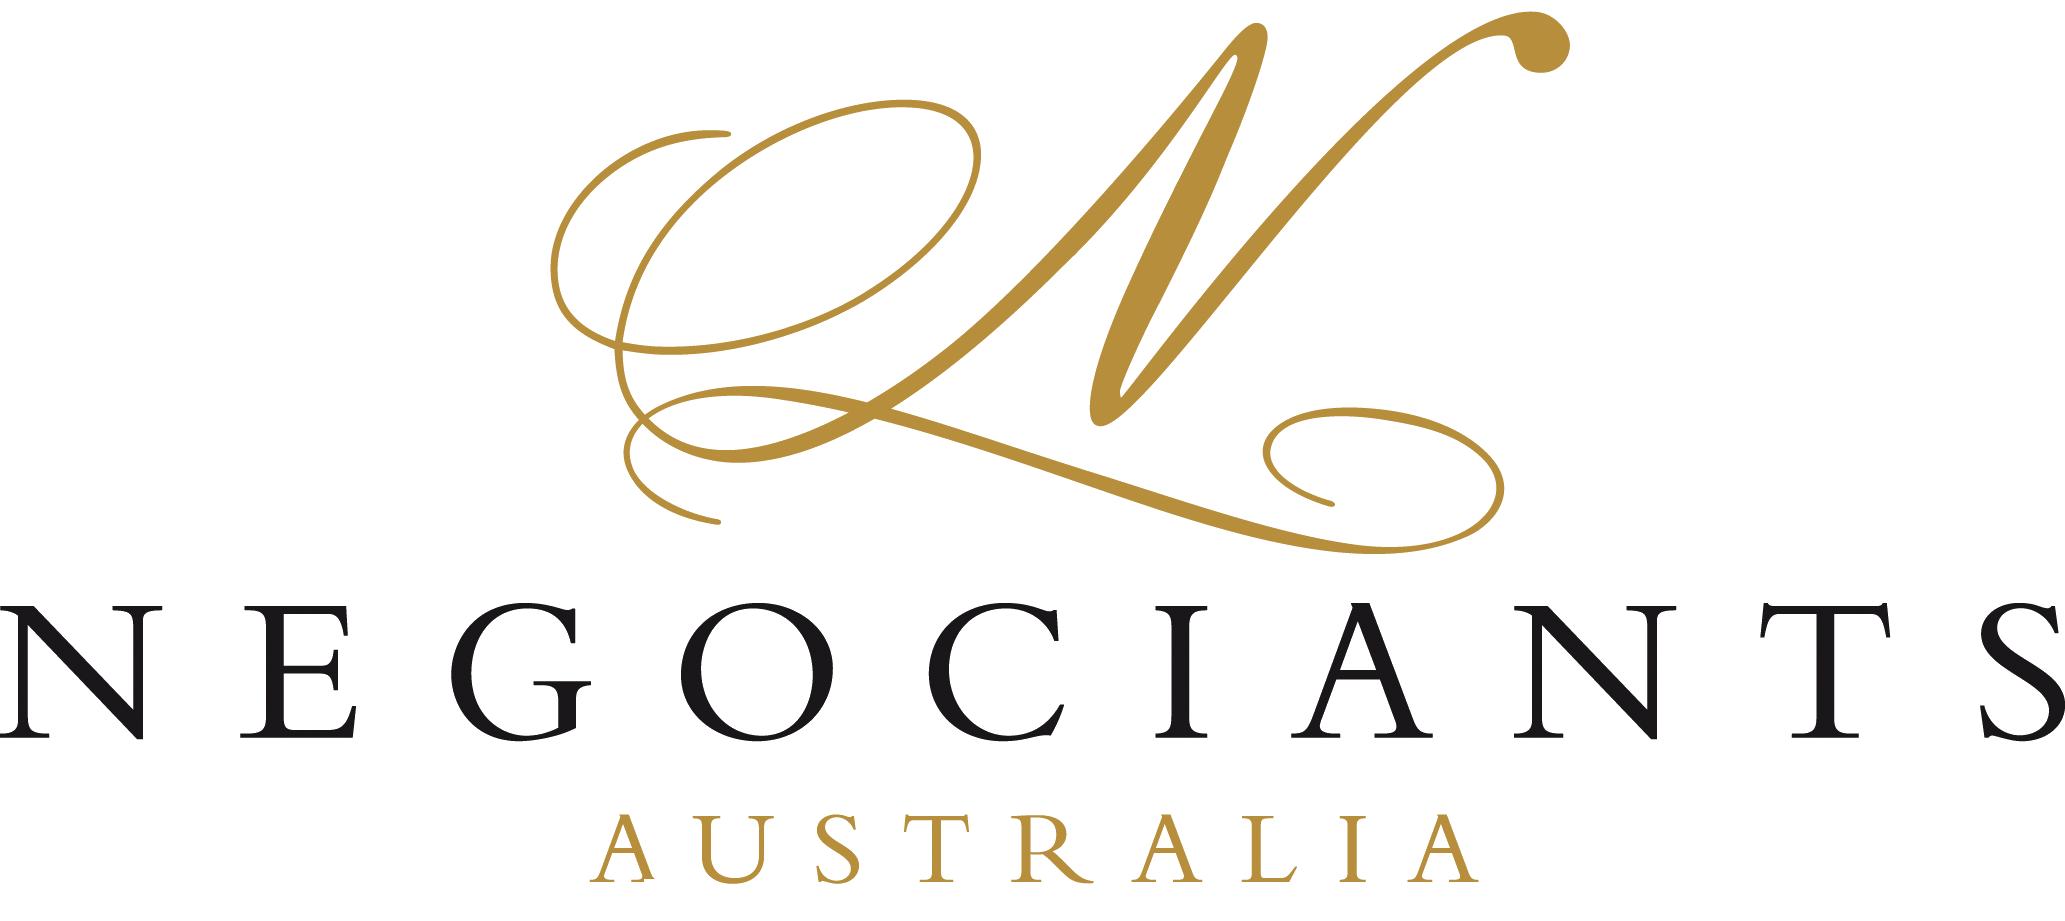 Negociants-Australia